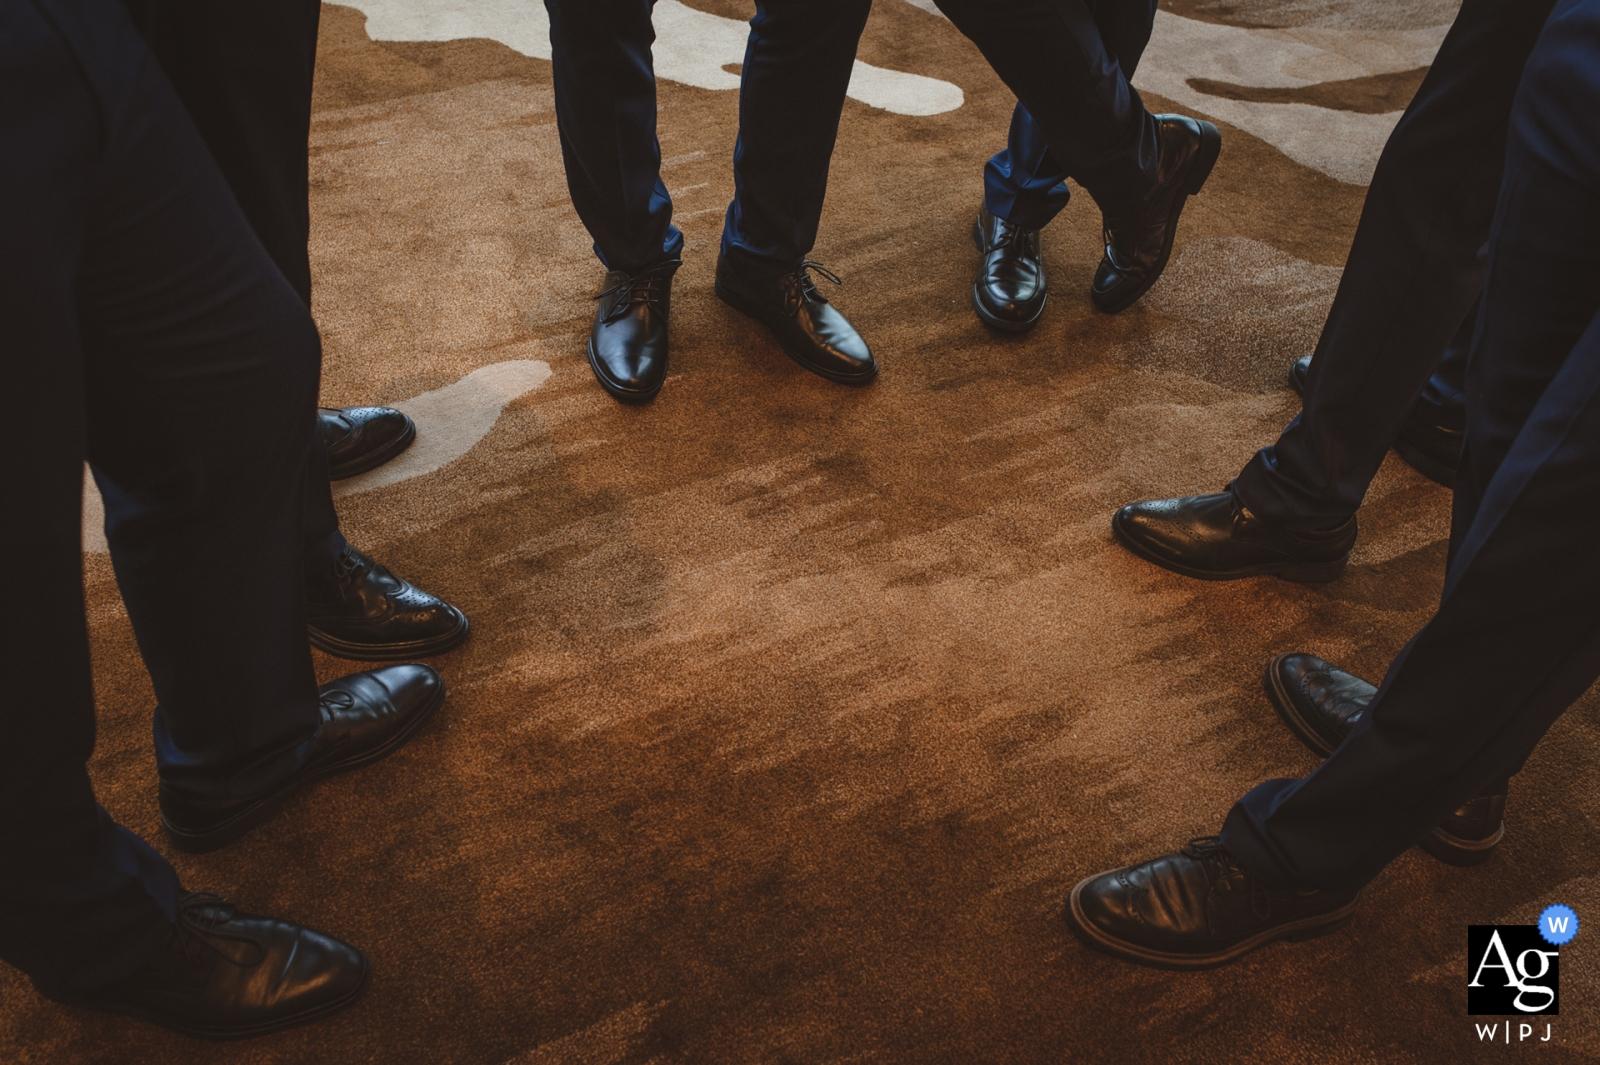 Hunan wedding artistic creative photography detail of men's feet